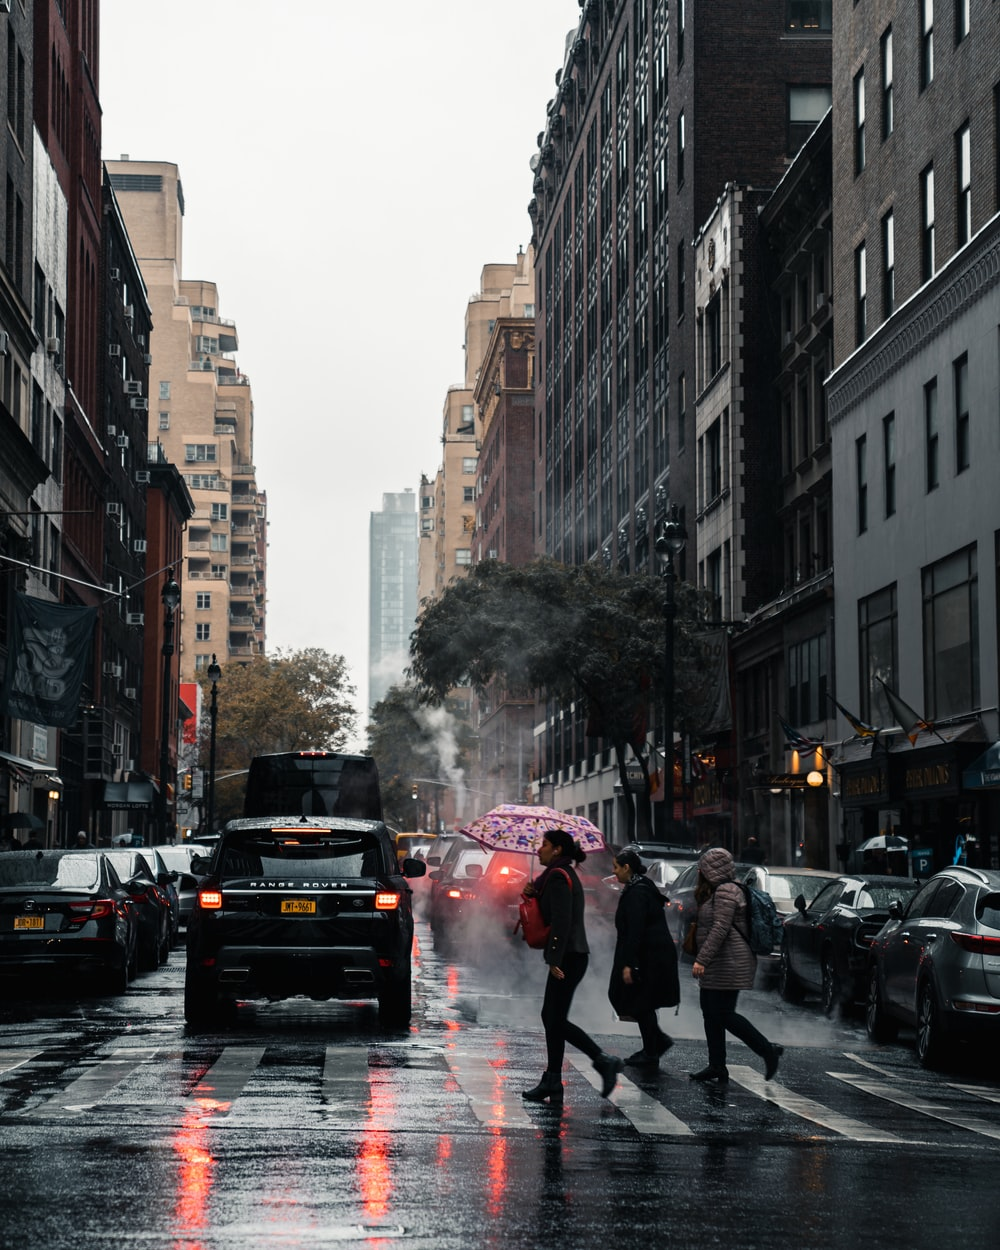 people crossing street during daytime